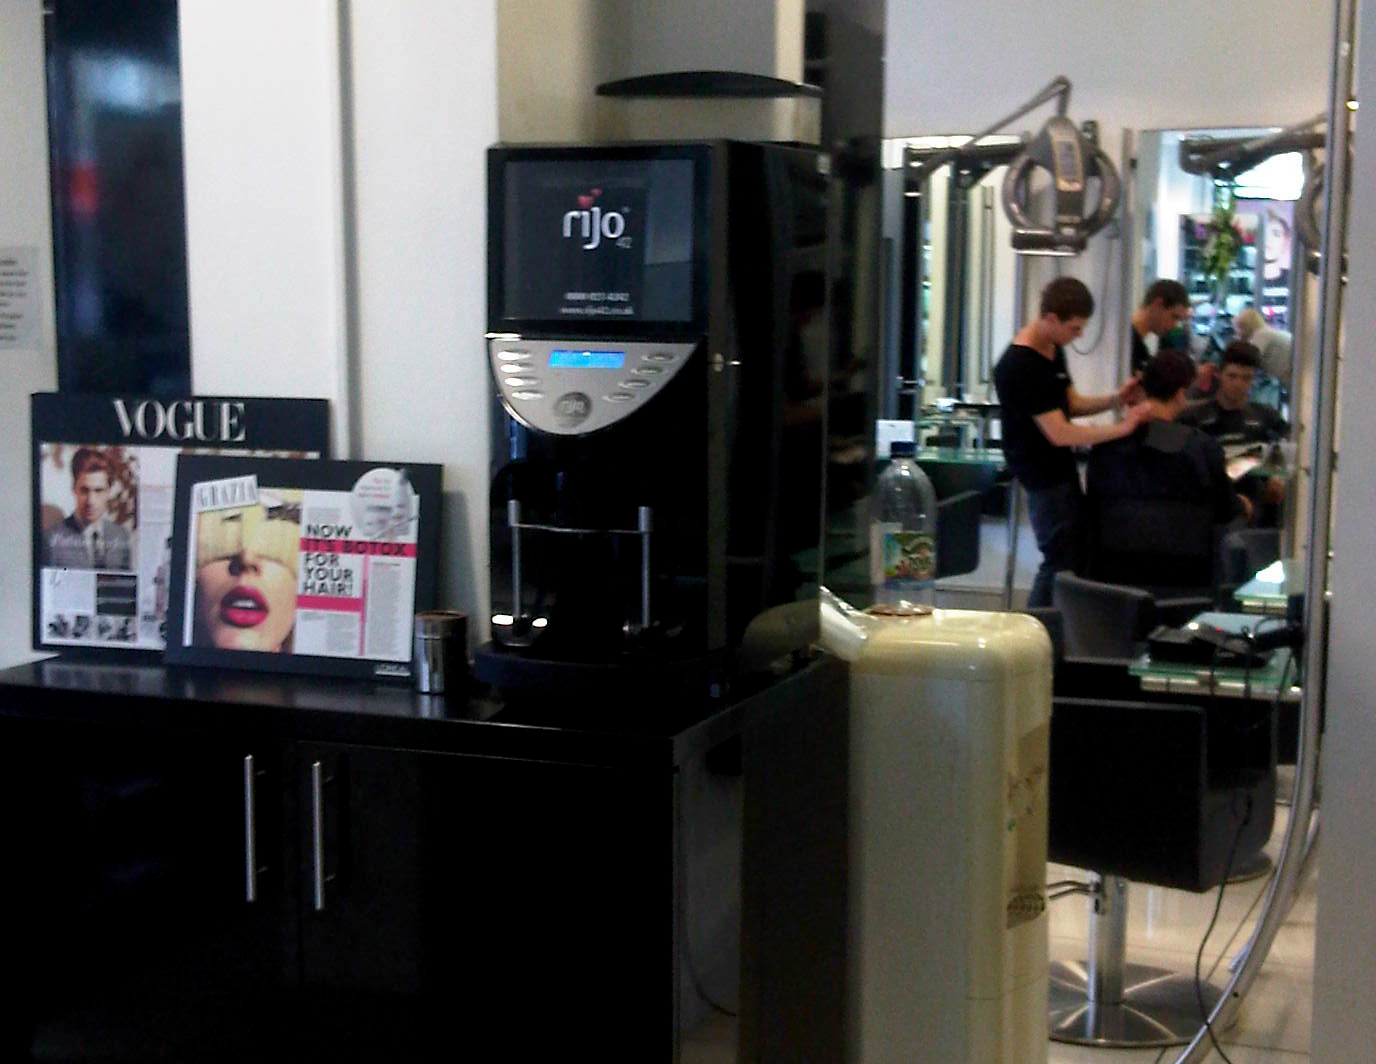 rijo42 Brasil Commercial Coffee Machine At Toni & Guy